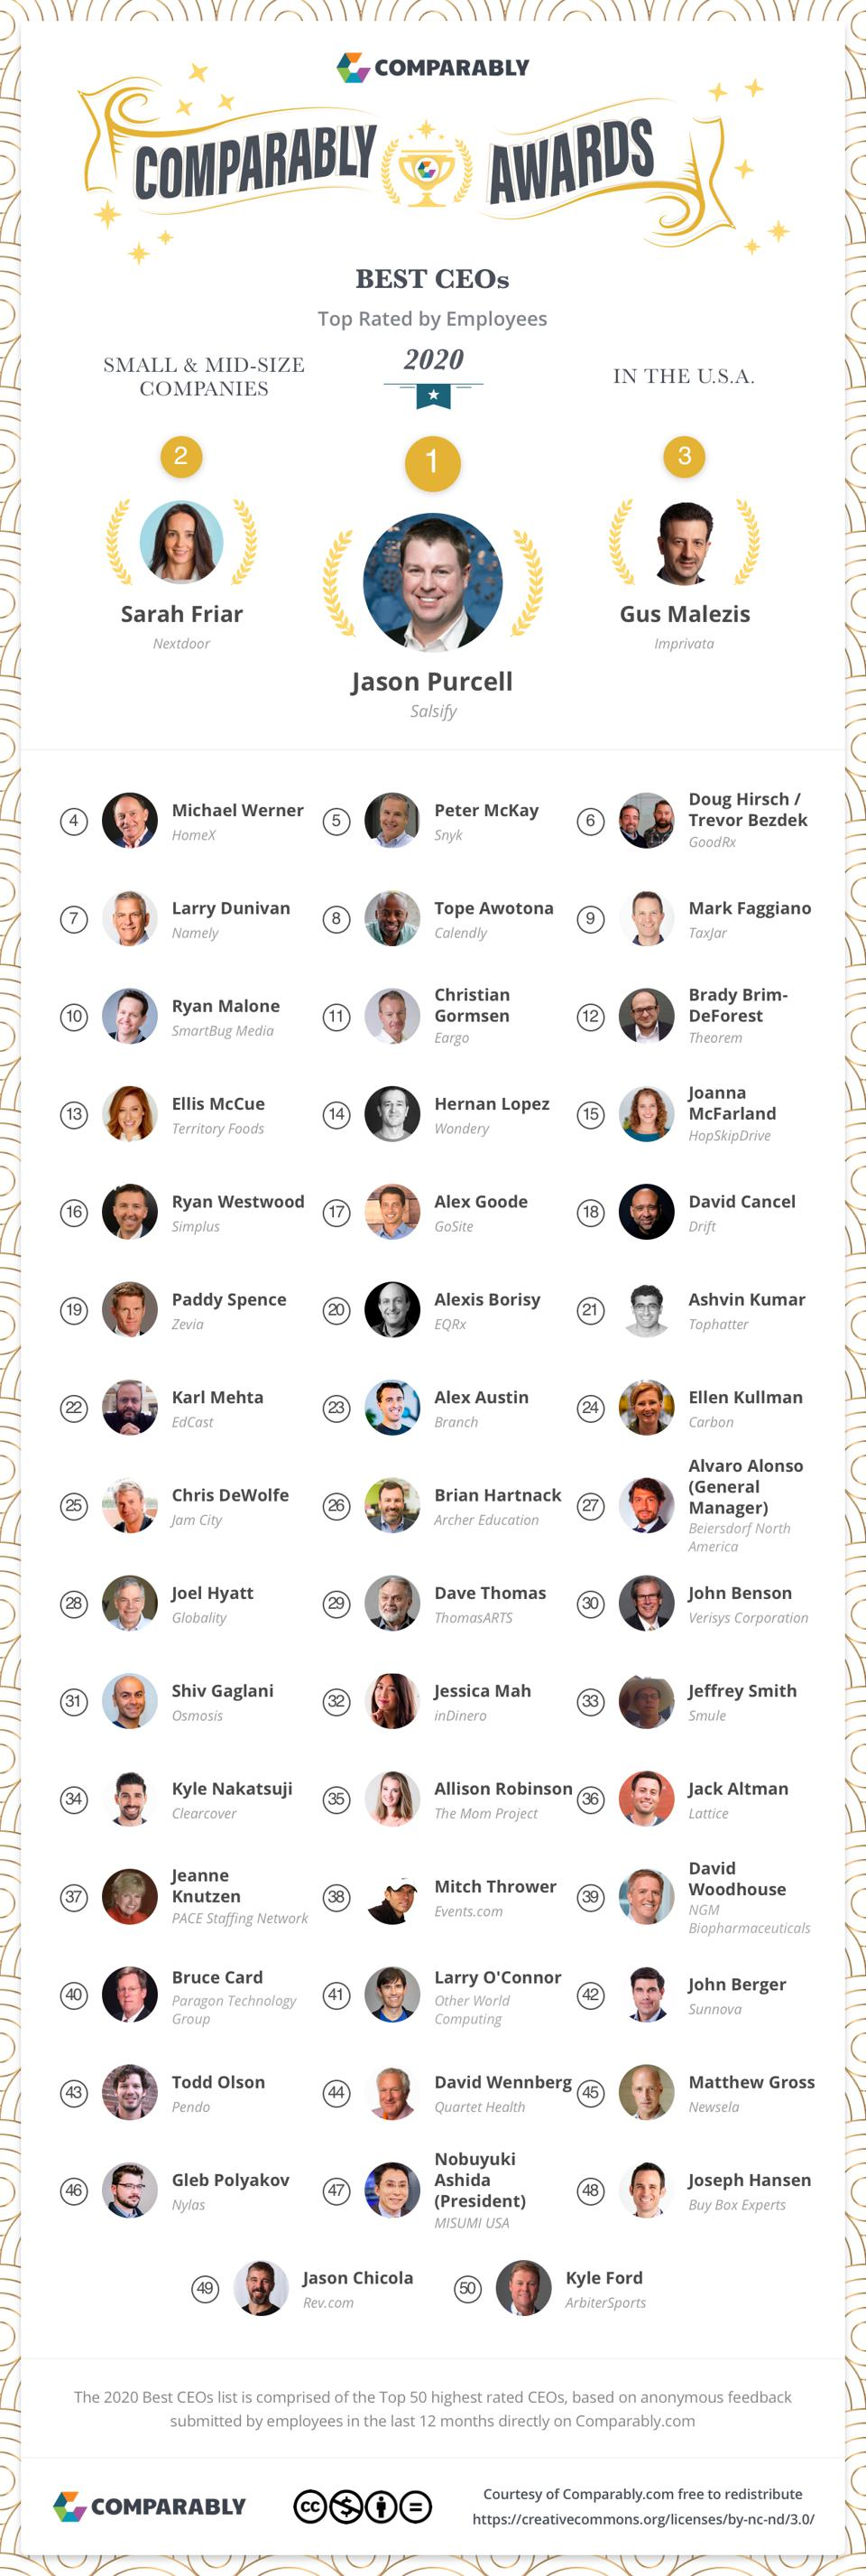 Top 50 small/medium-size company CEOs